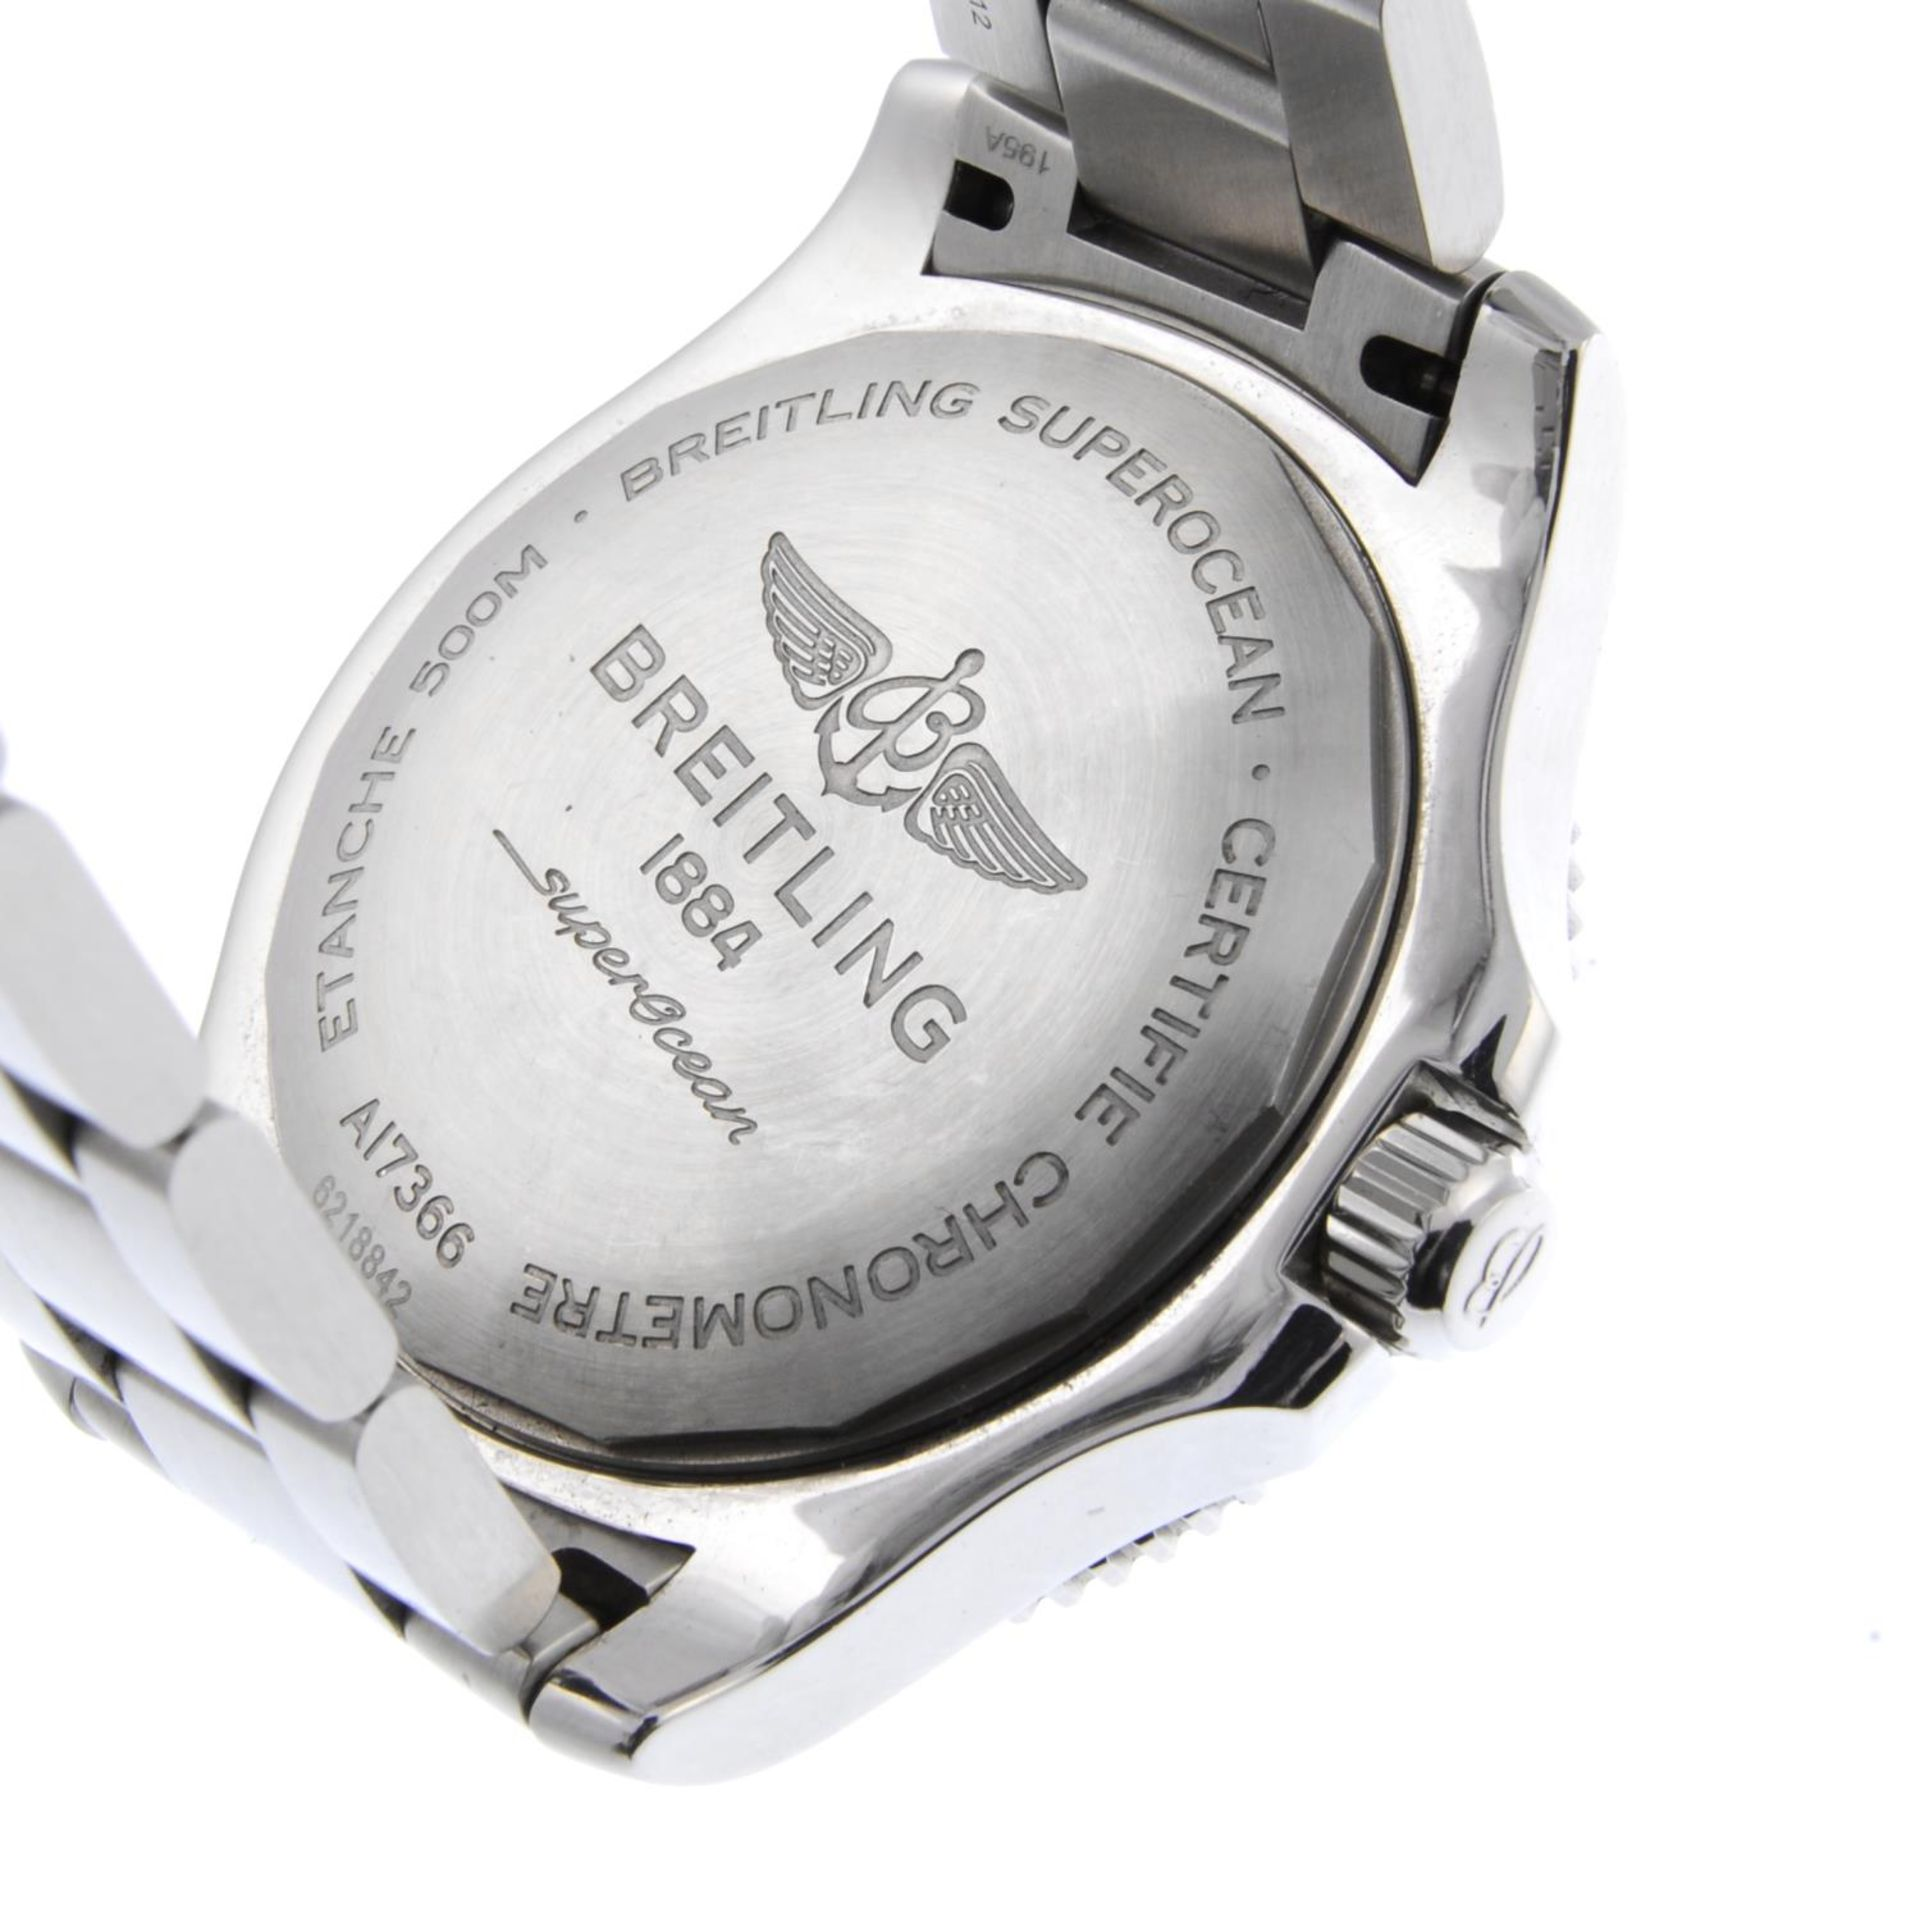 Los 8 - BREITLING - a gentleman's SuperOcean 42 bracelet watch.